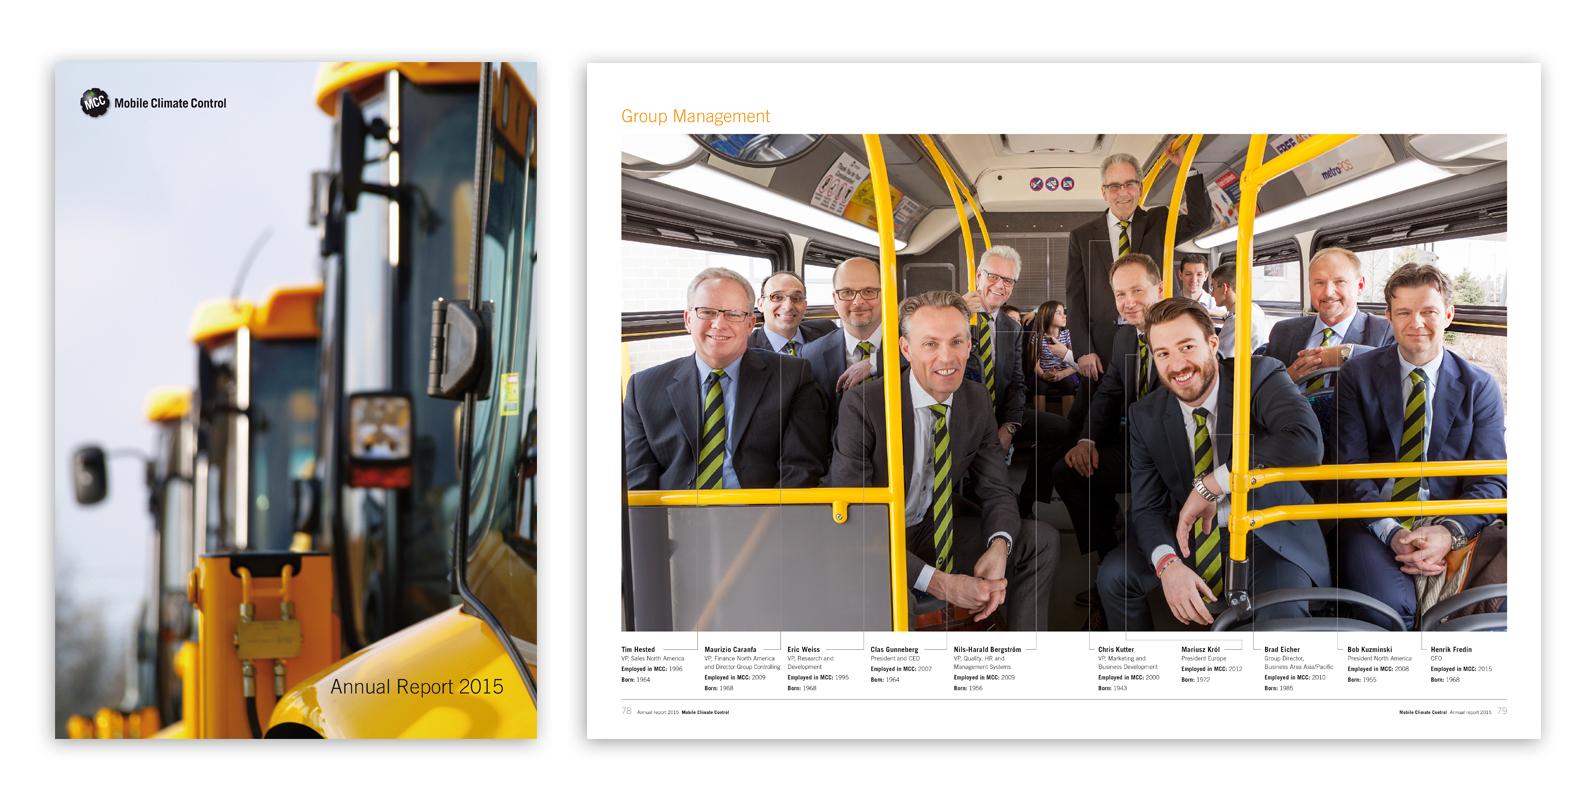 MCC Annual Report 2015